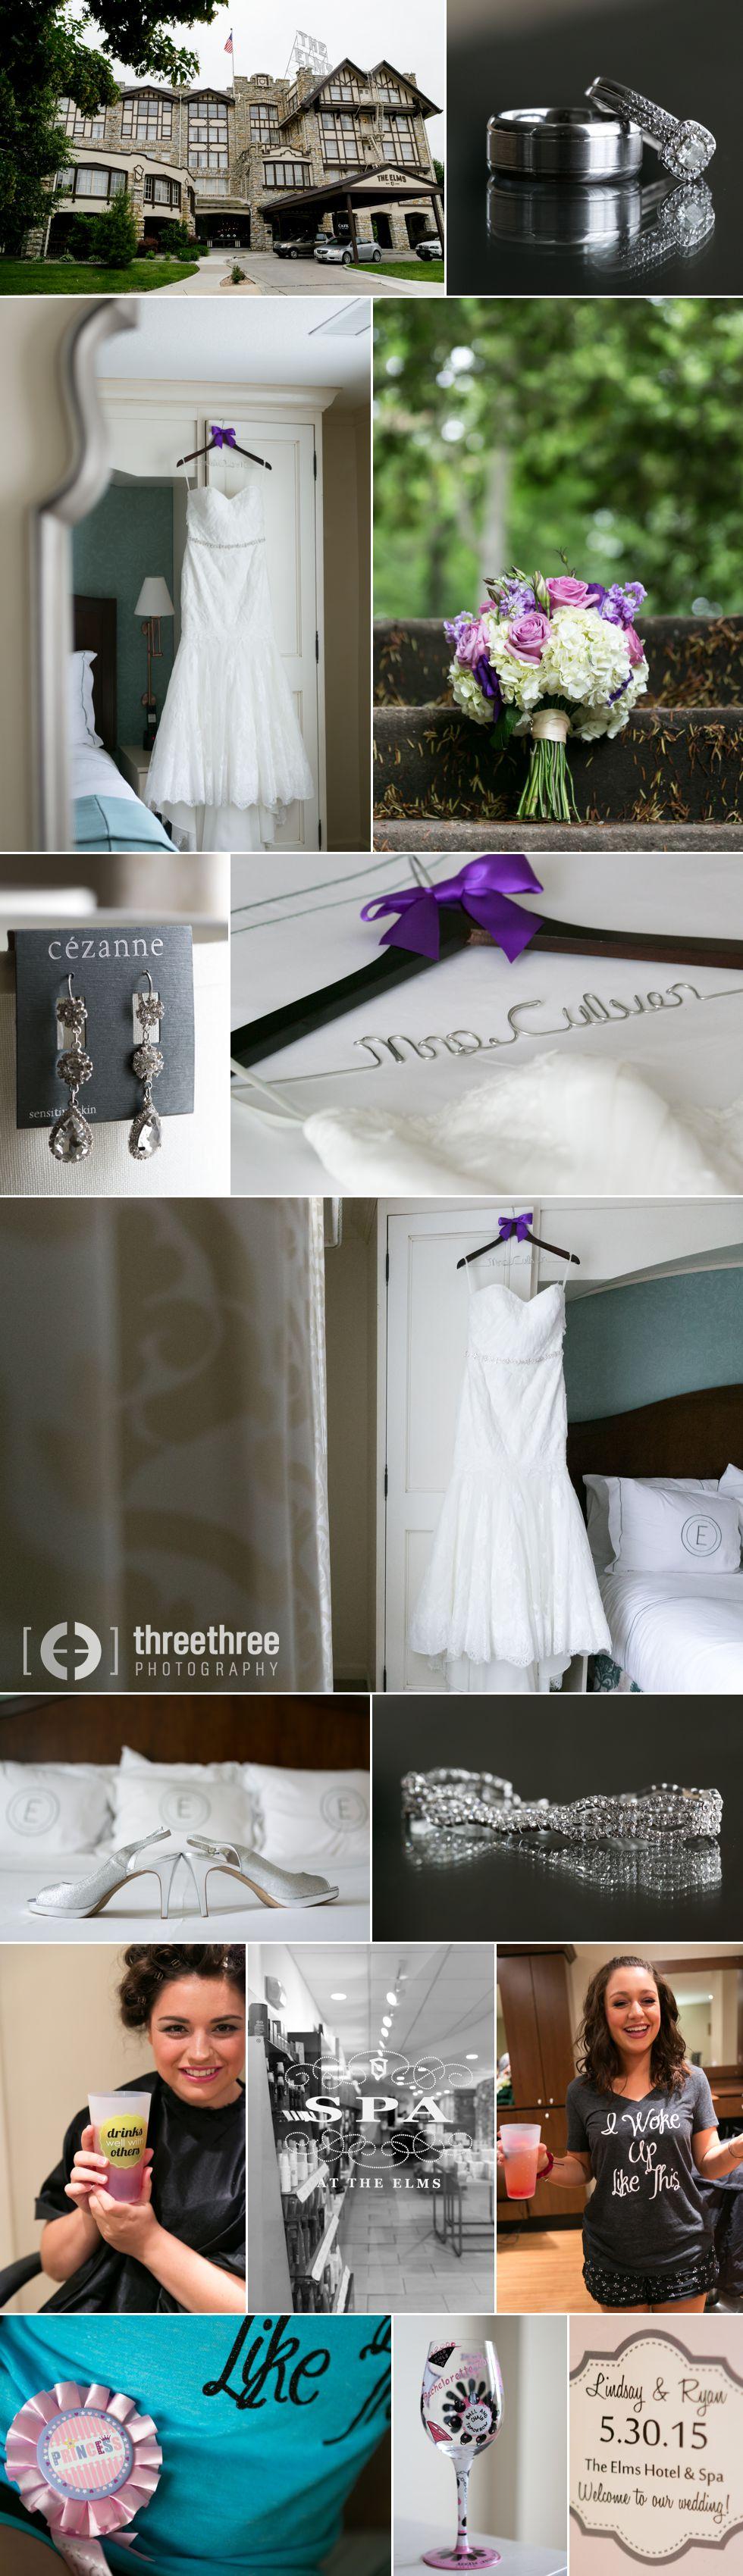 Lindsay_wedding_blog 1